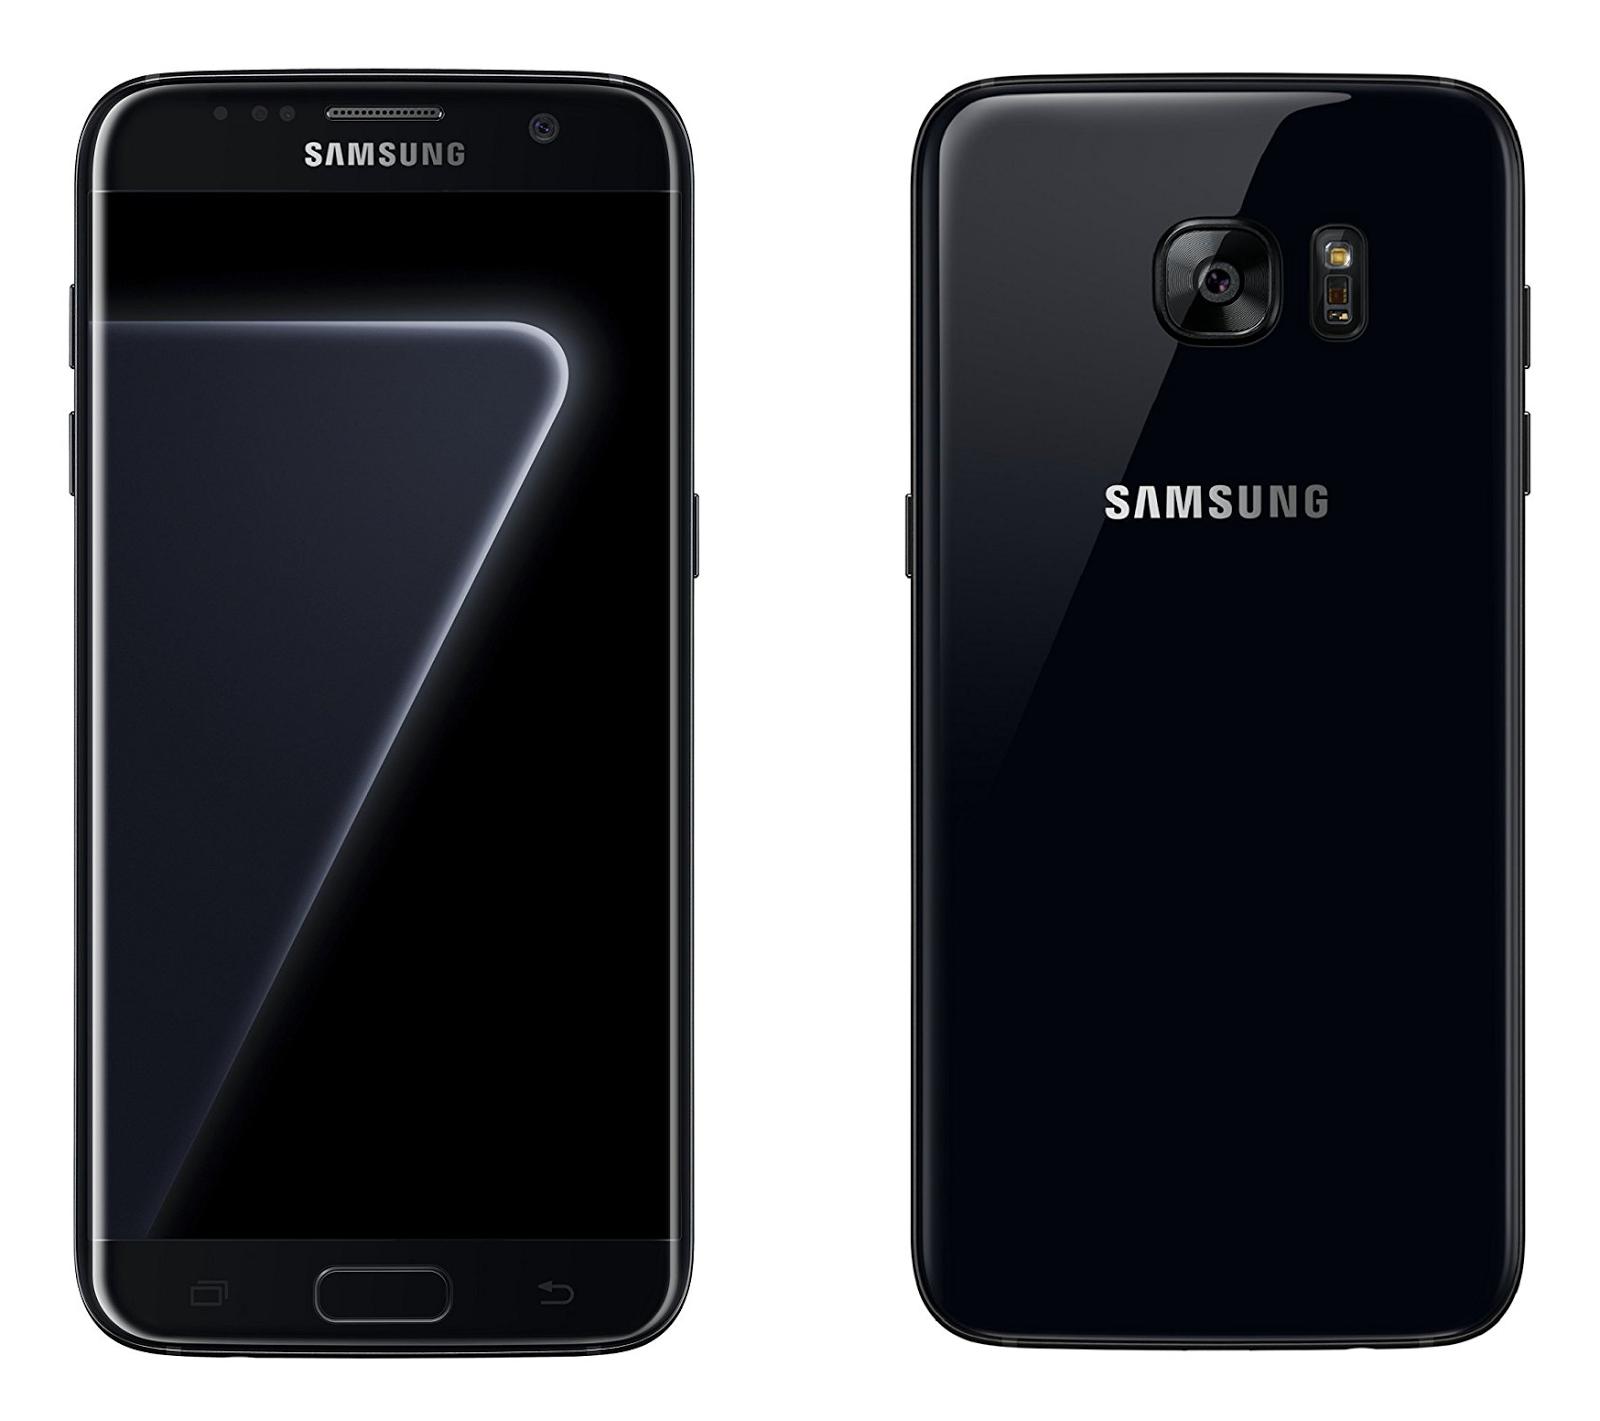 Samsung Galaxy S7 Edge Black Pearl With 128gb Storage